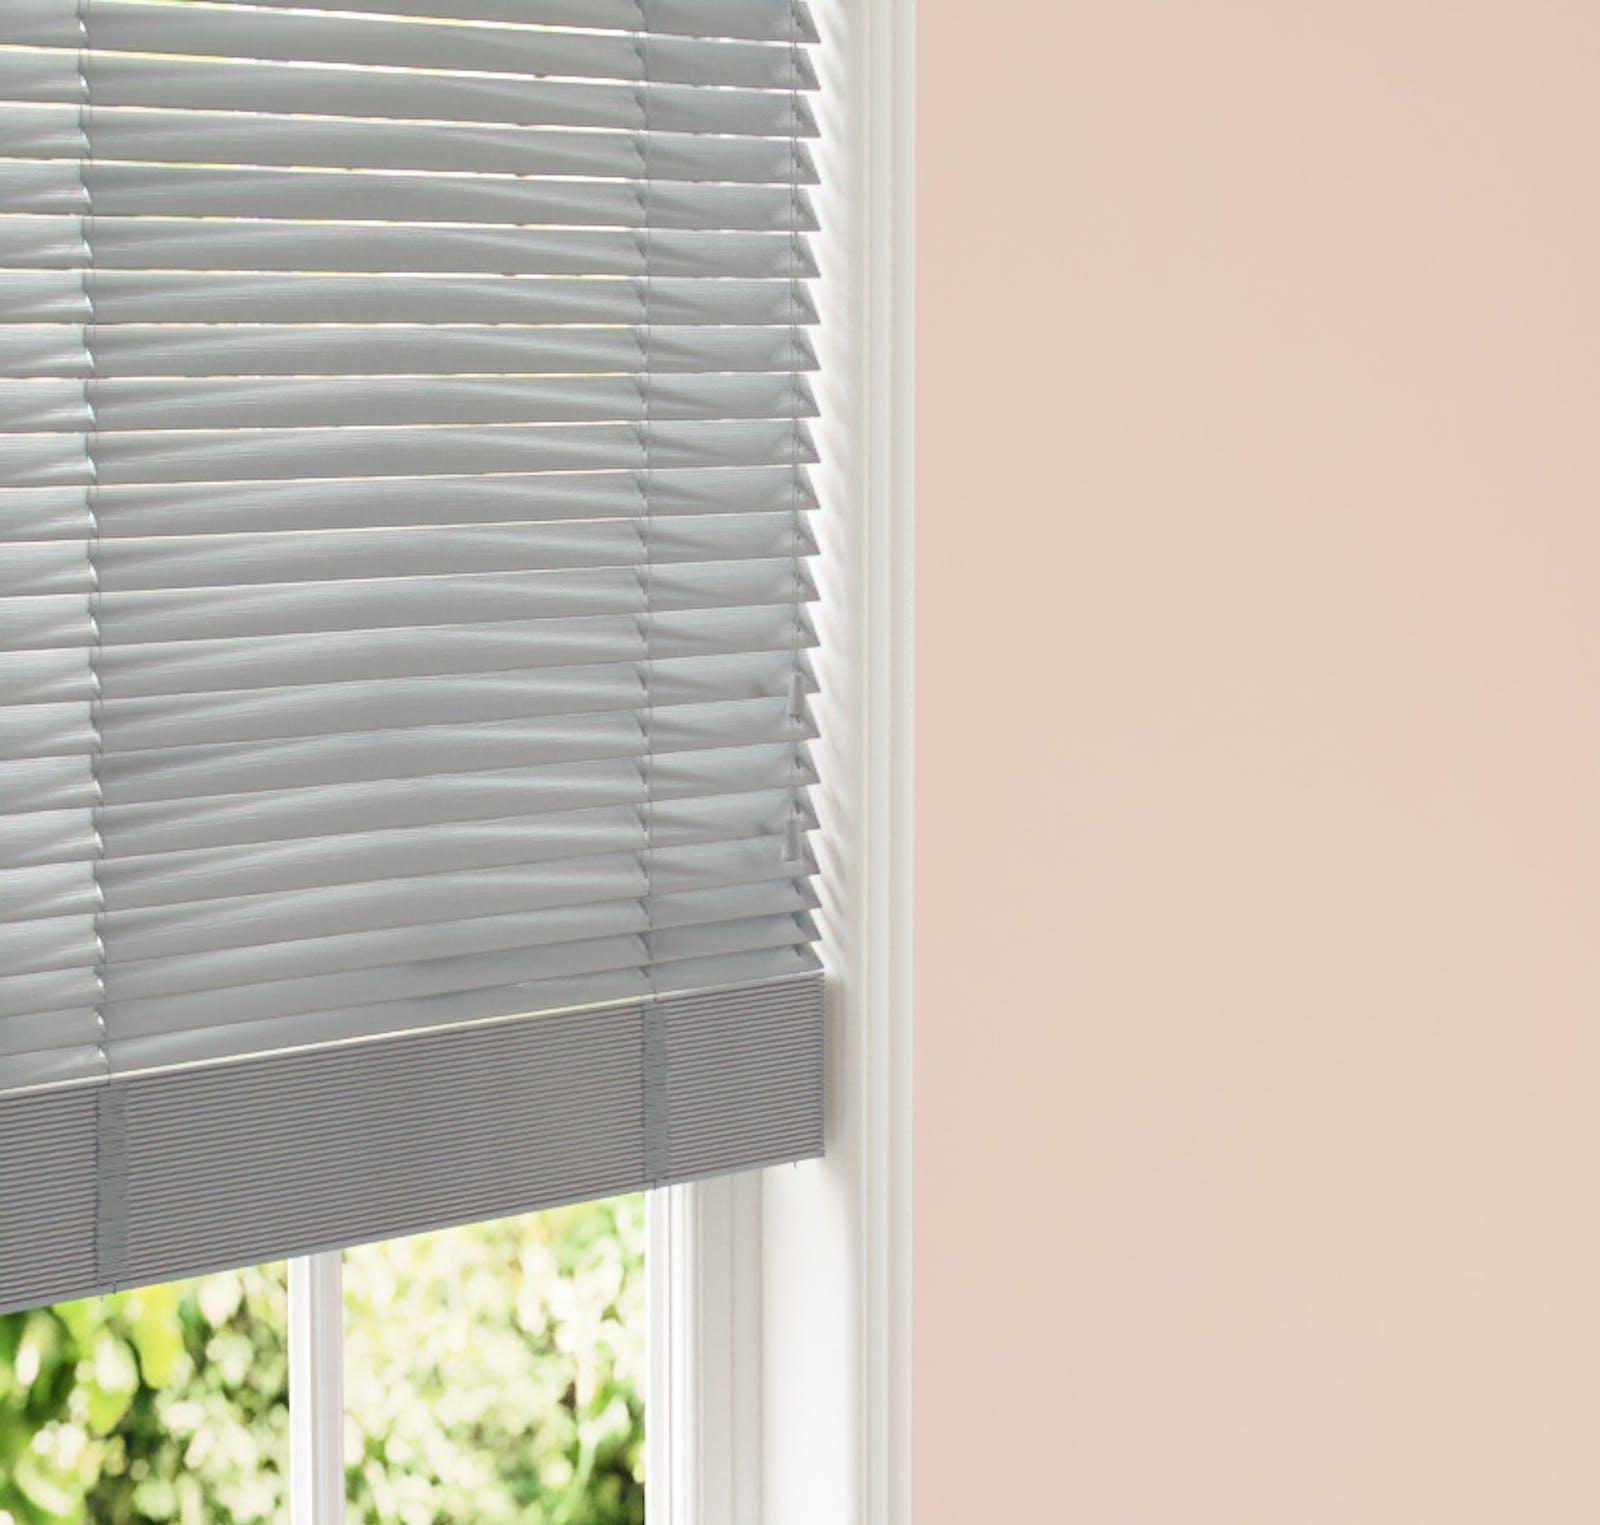 Lick Venetian fine grain blinds in Grey 06 against a Pink 02 wall